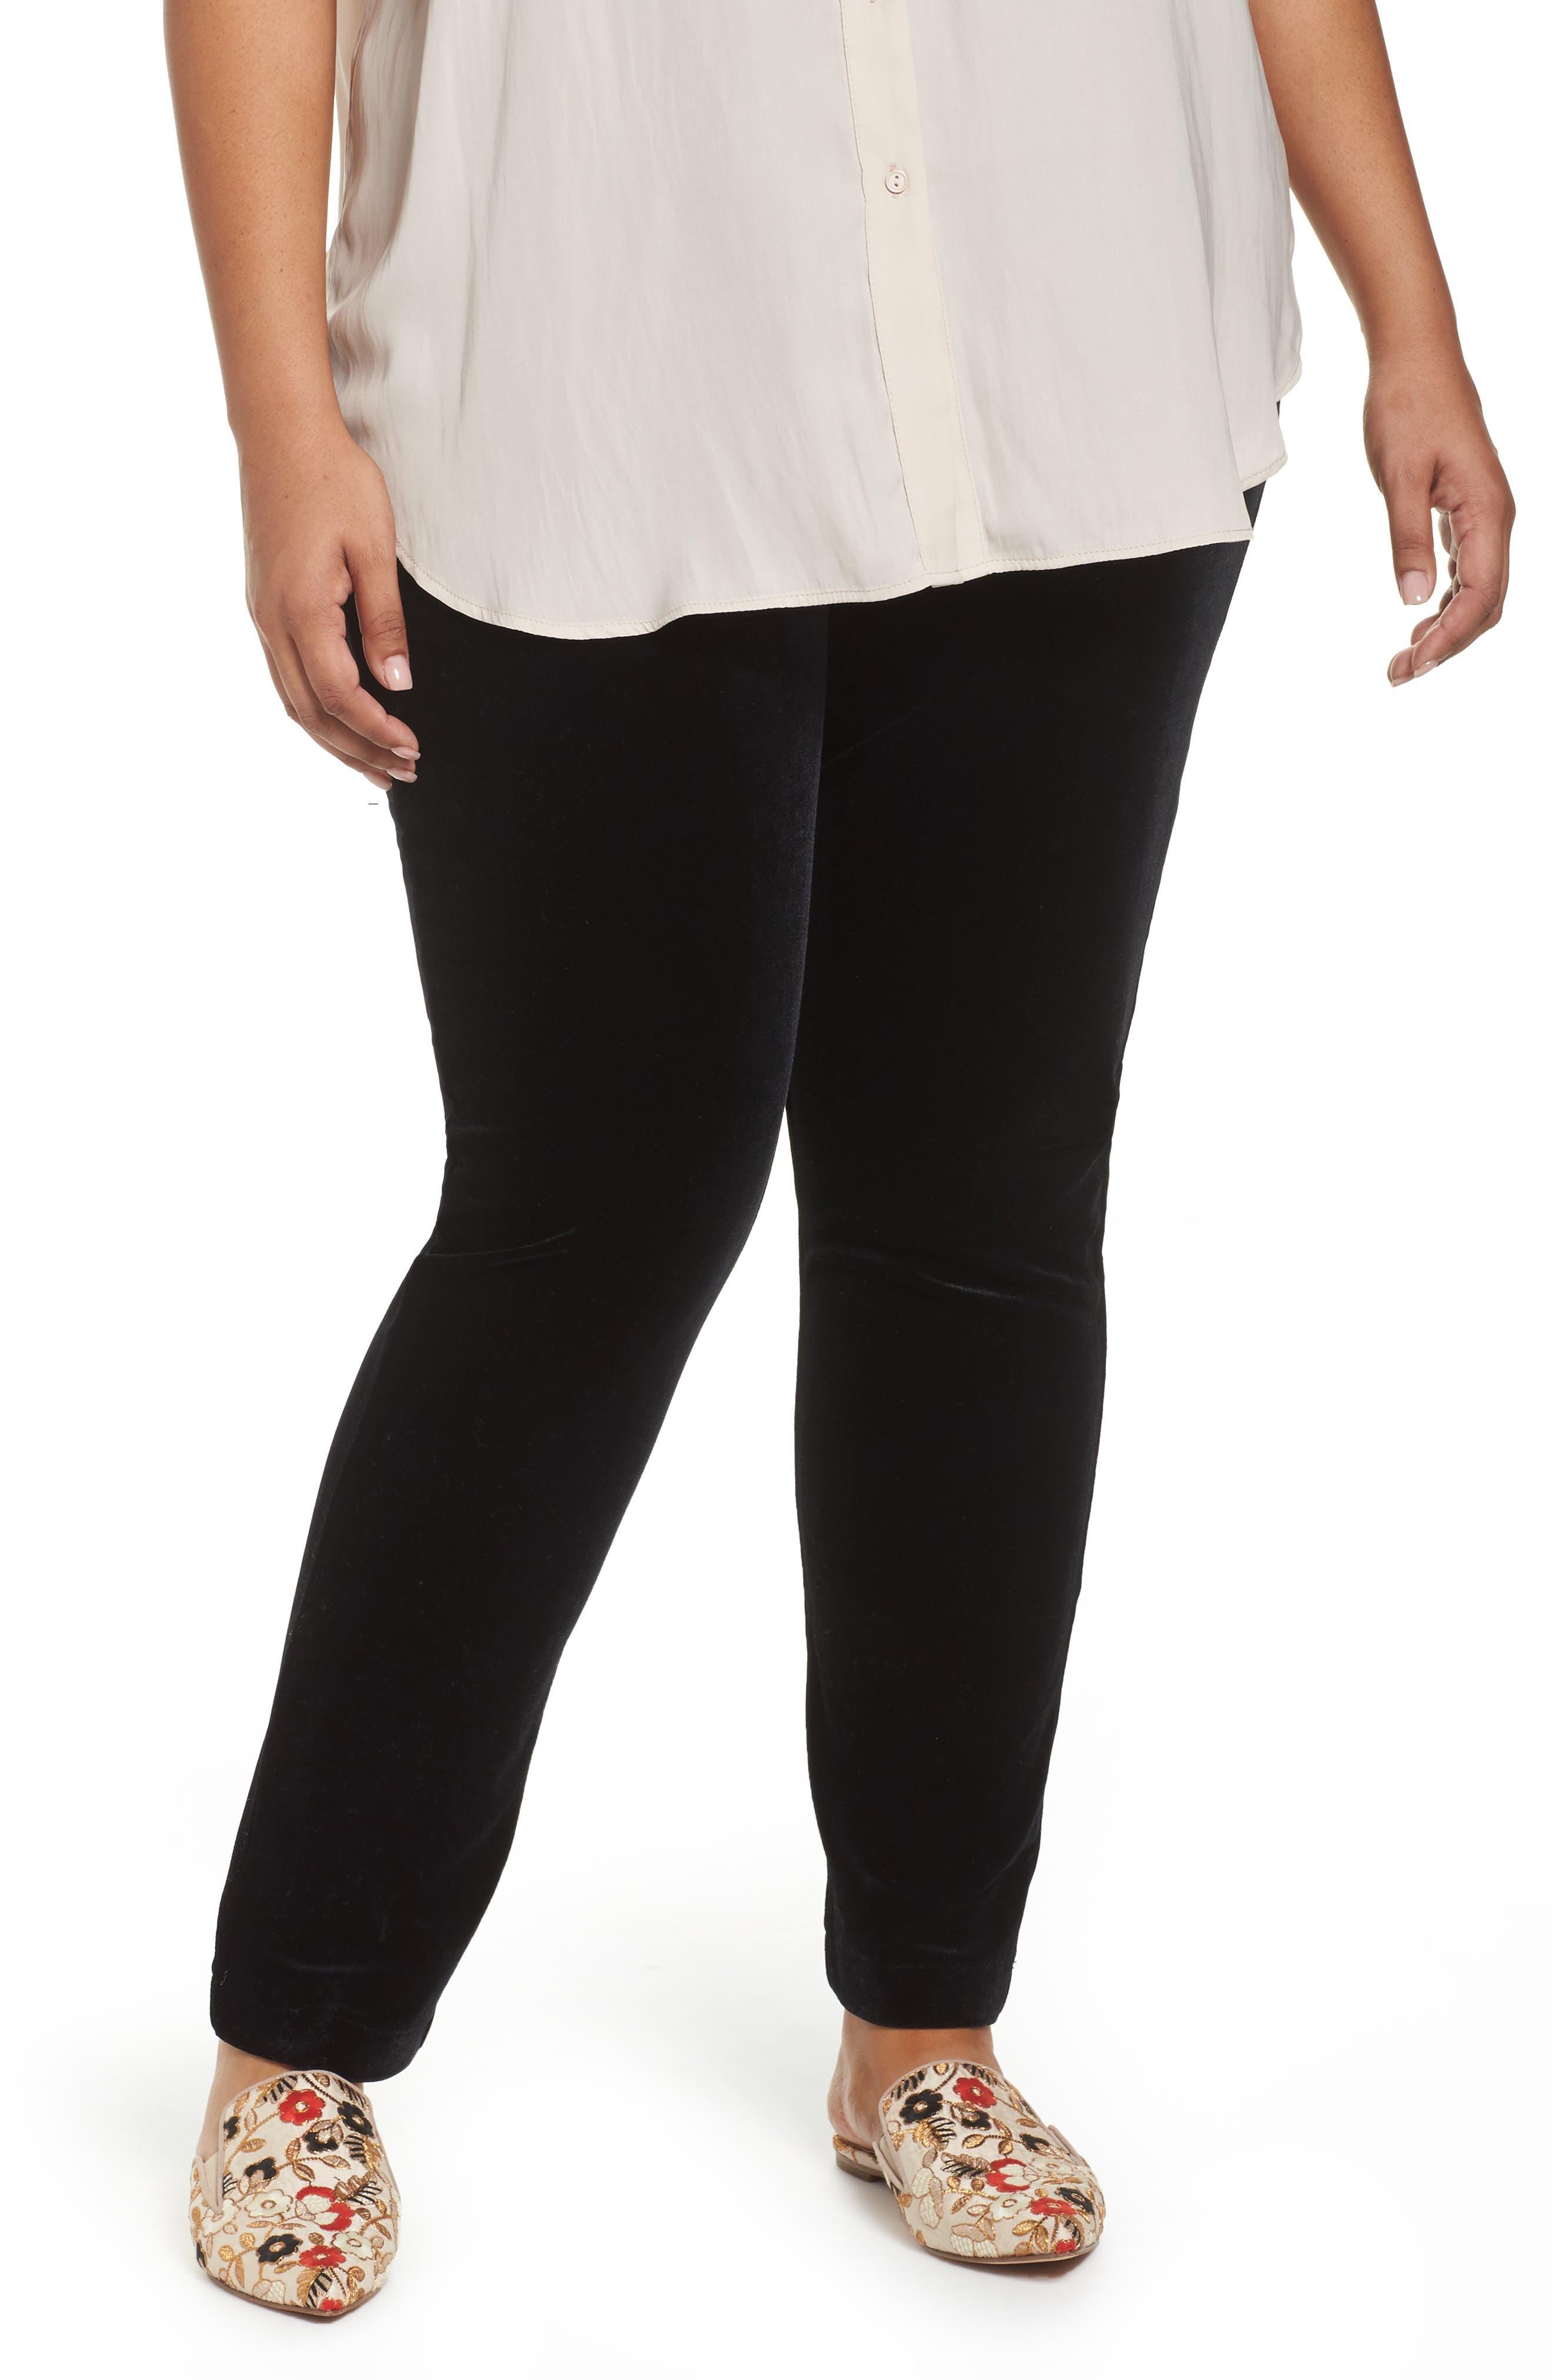 ELVI Black Velvet Trousers (Plus Size)